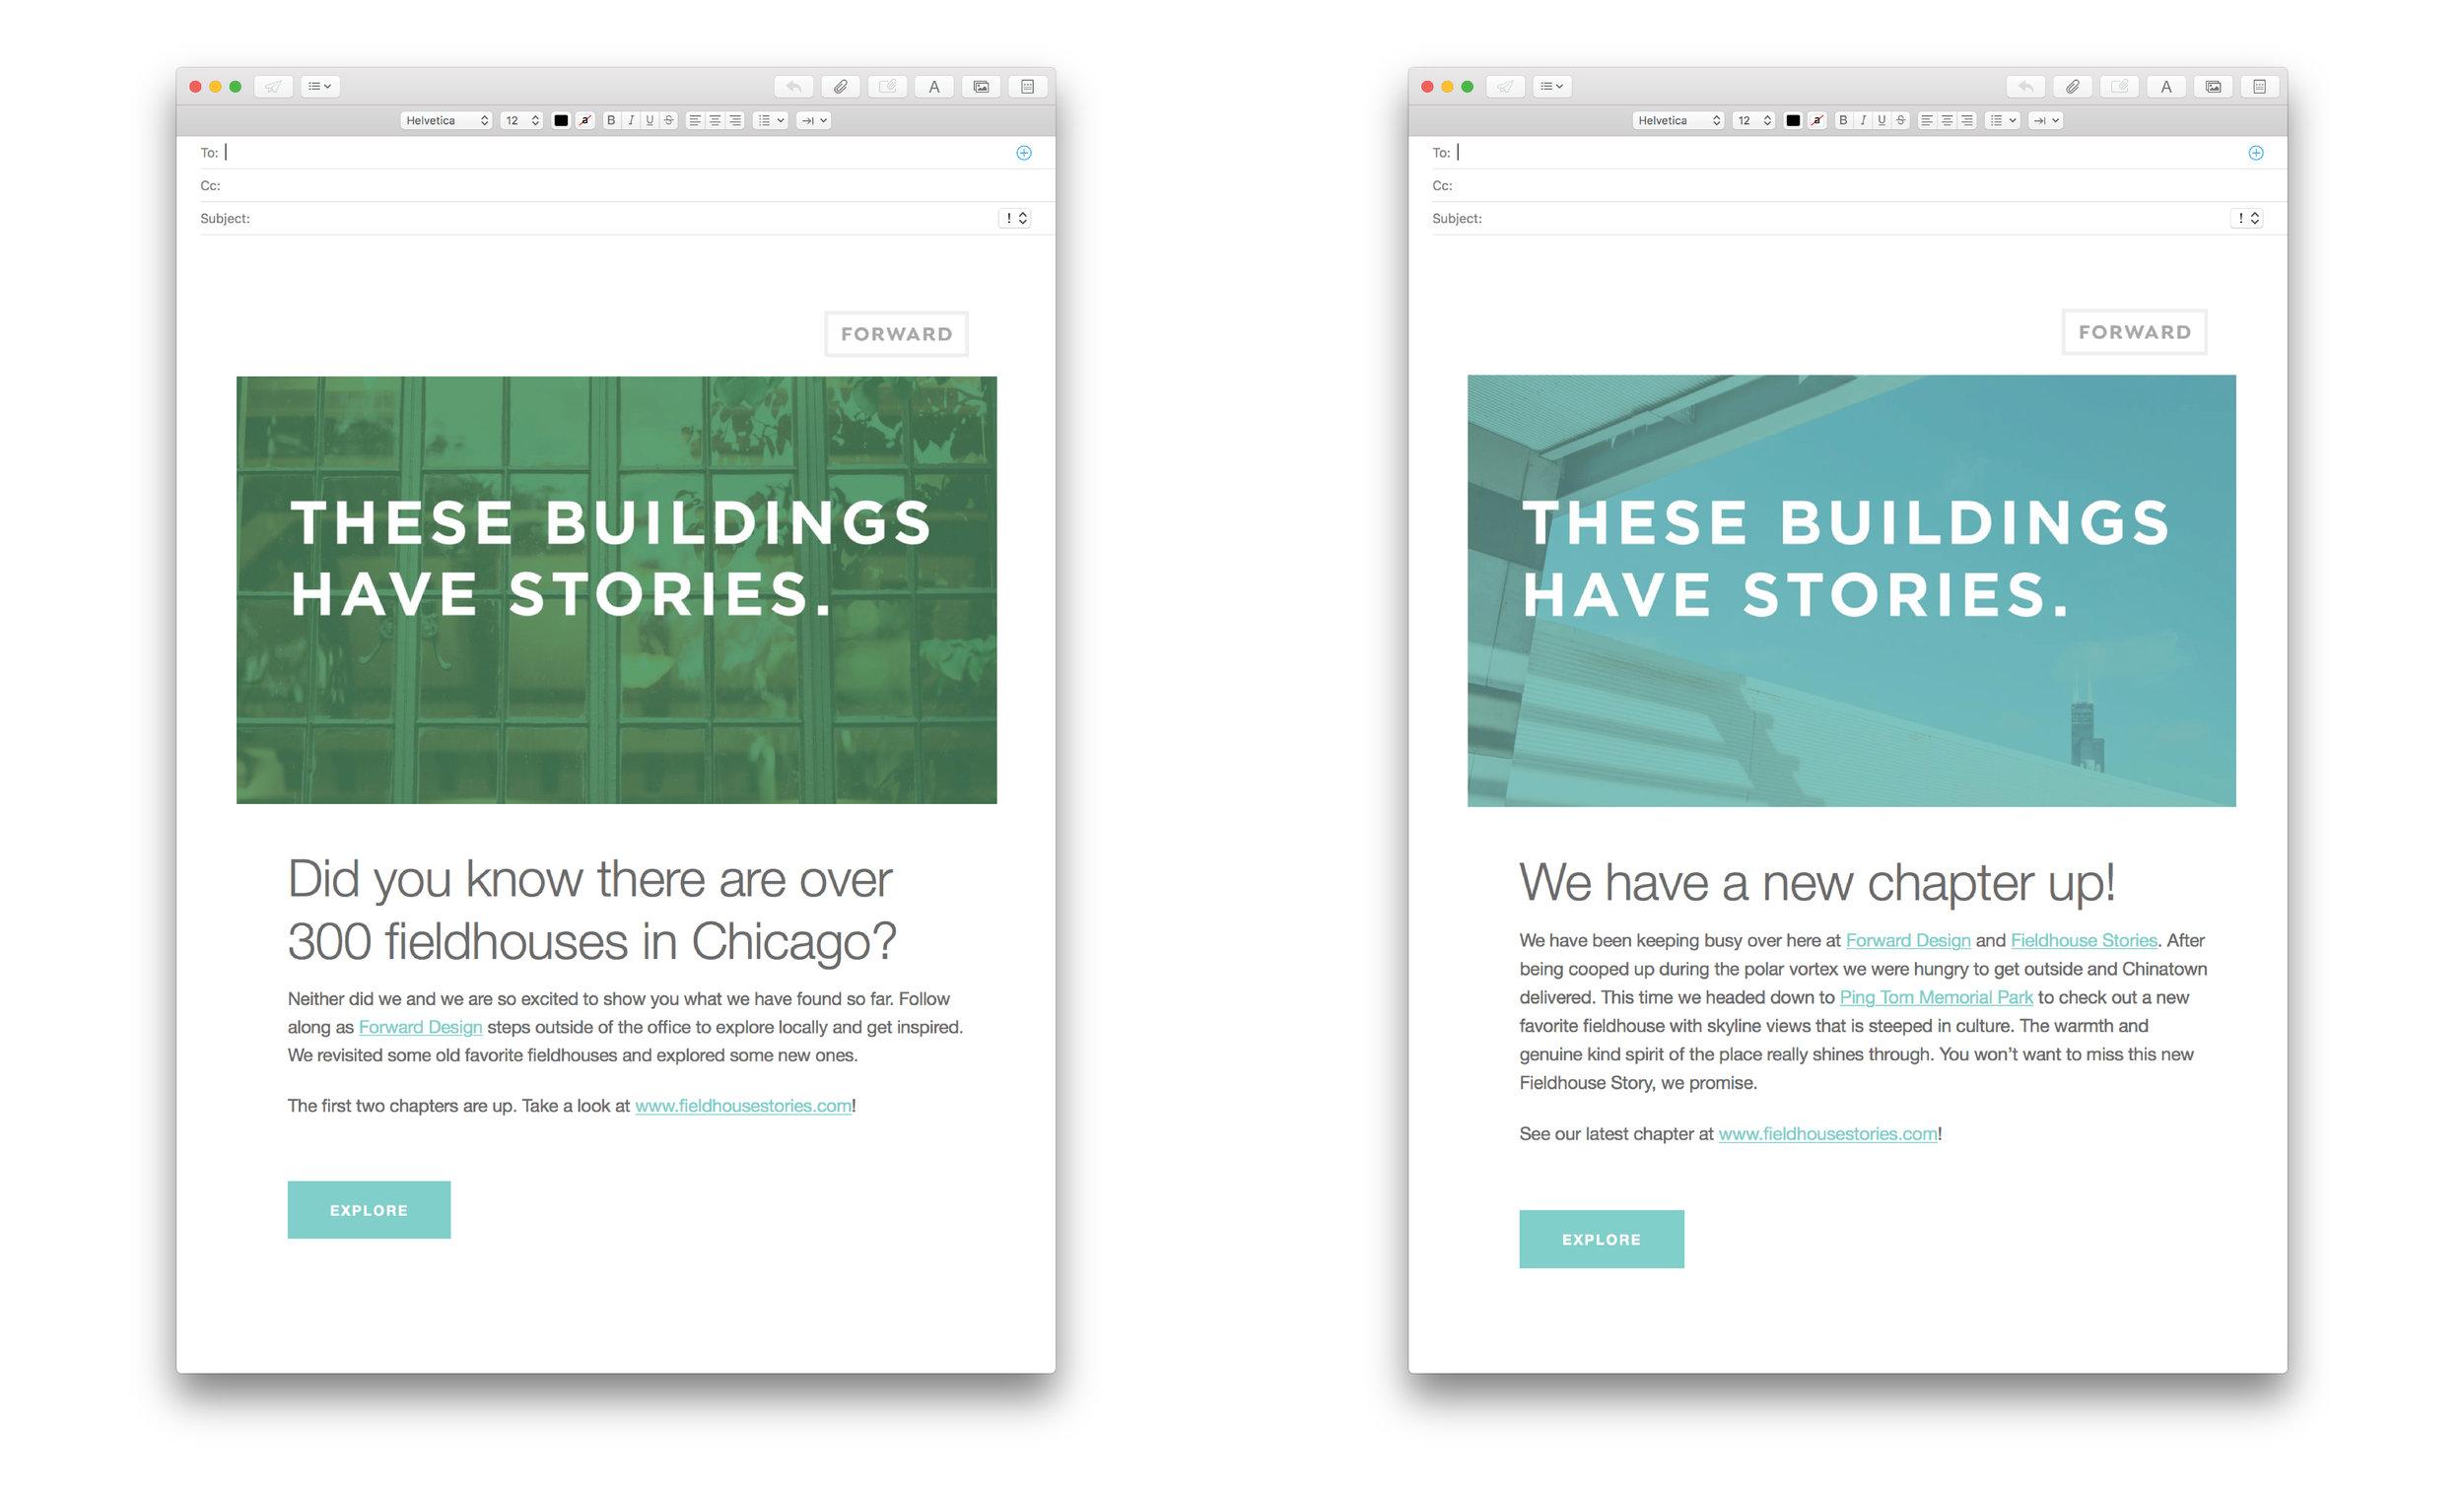 Forward Design Chicago Social Media Campaign_2019_Fieldhouse_37.jpg